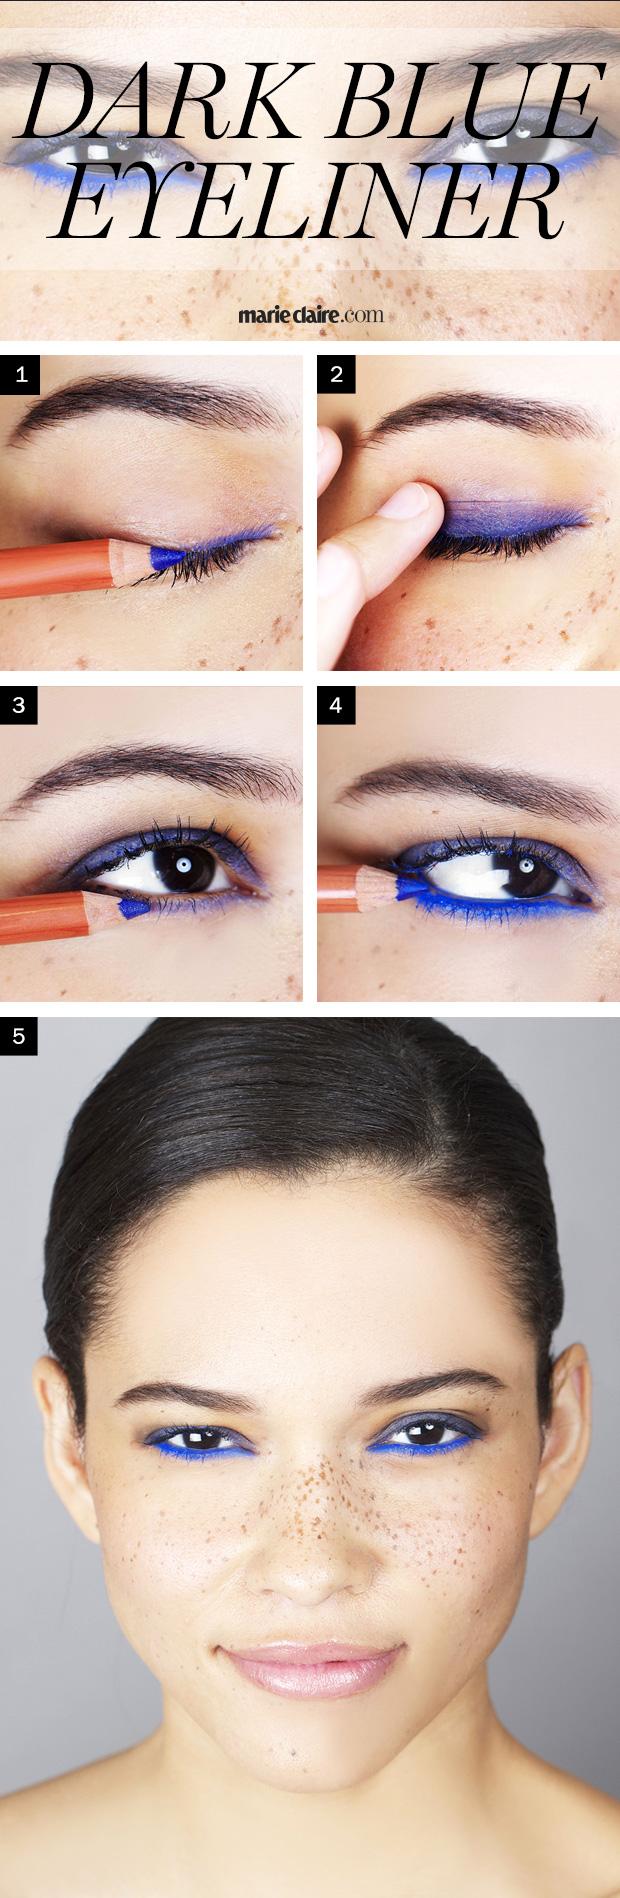 Makeup How-To: Dark Blue Eyeliner